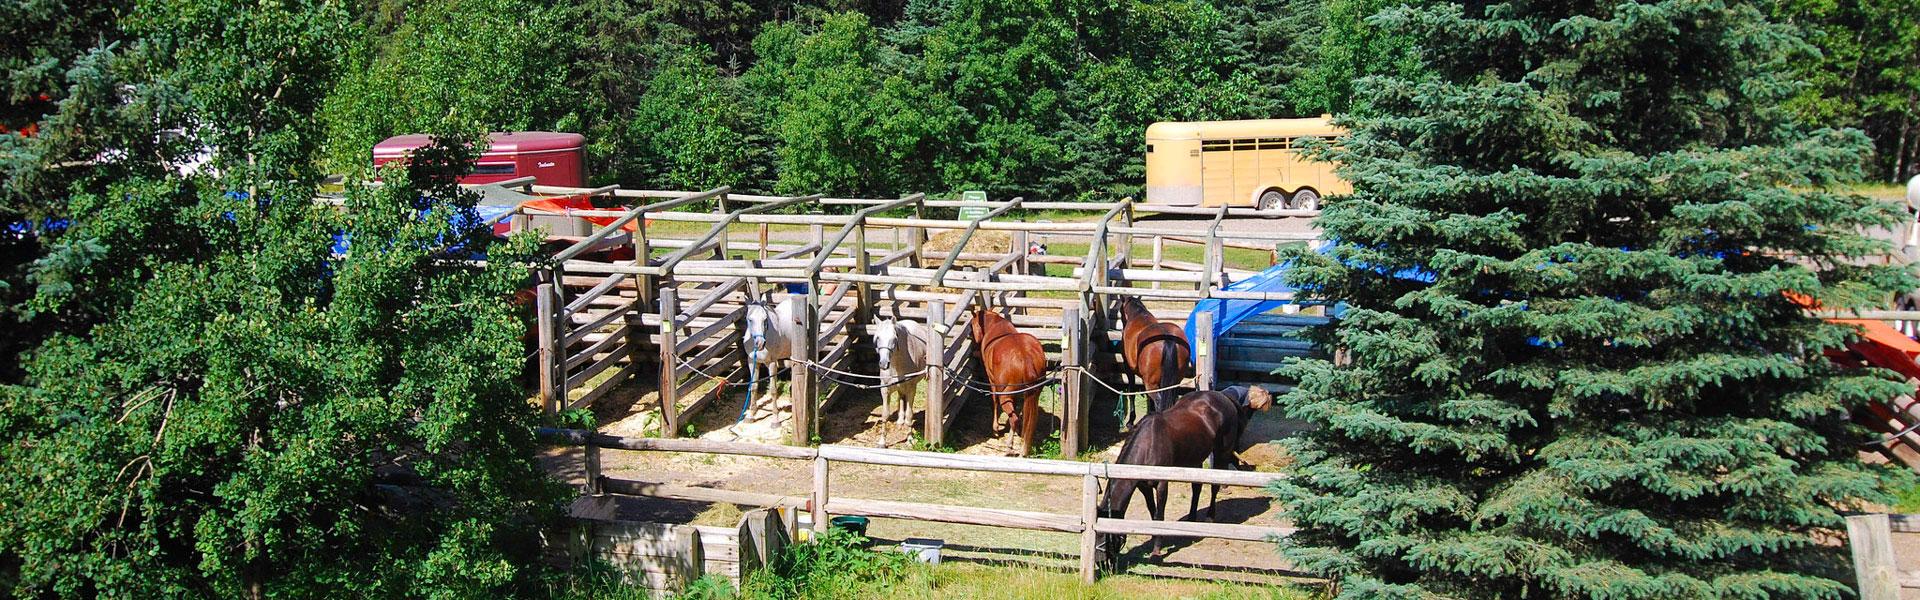 Equestrian Camping Alberta Parks